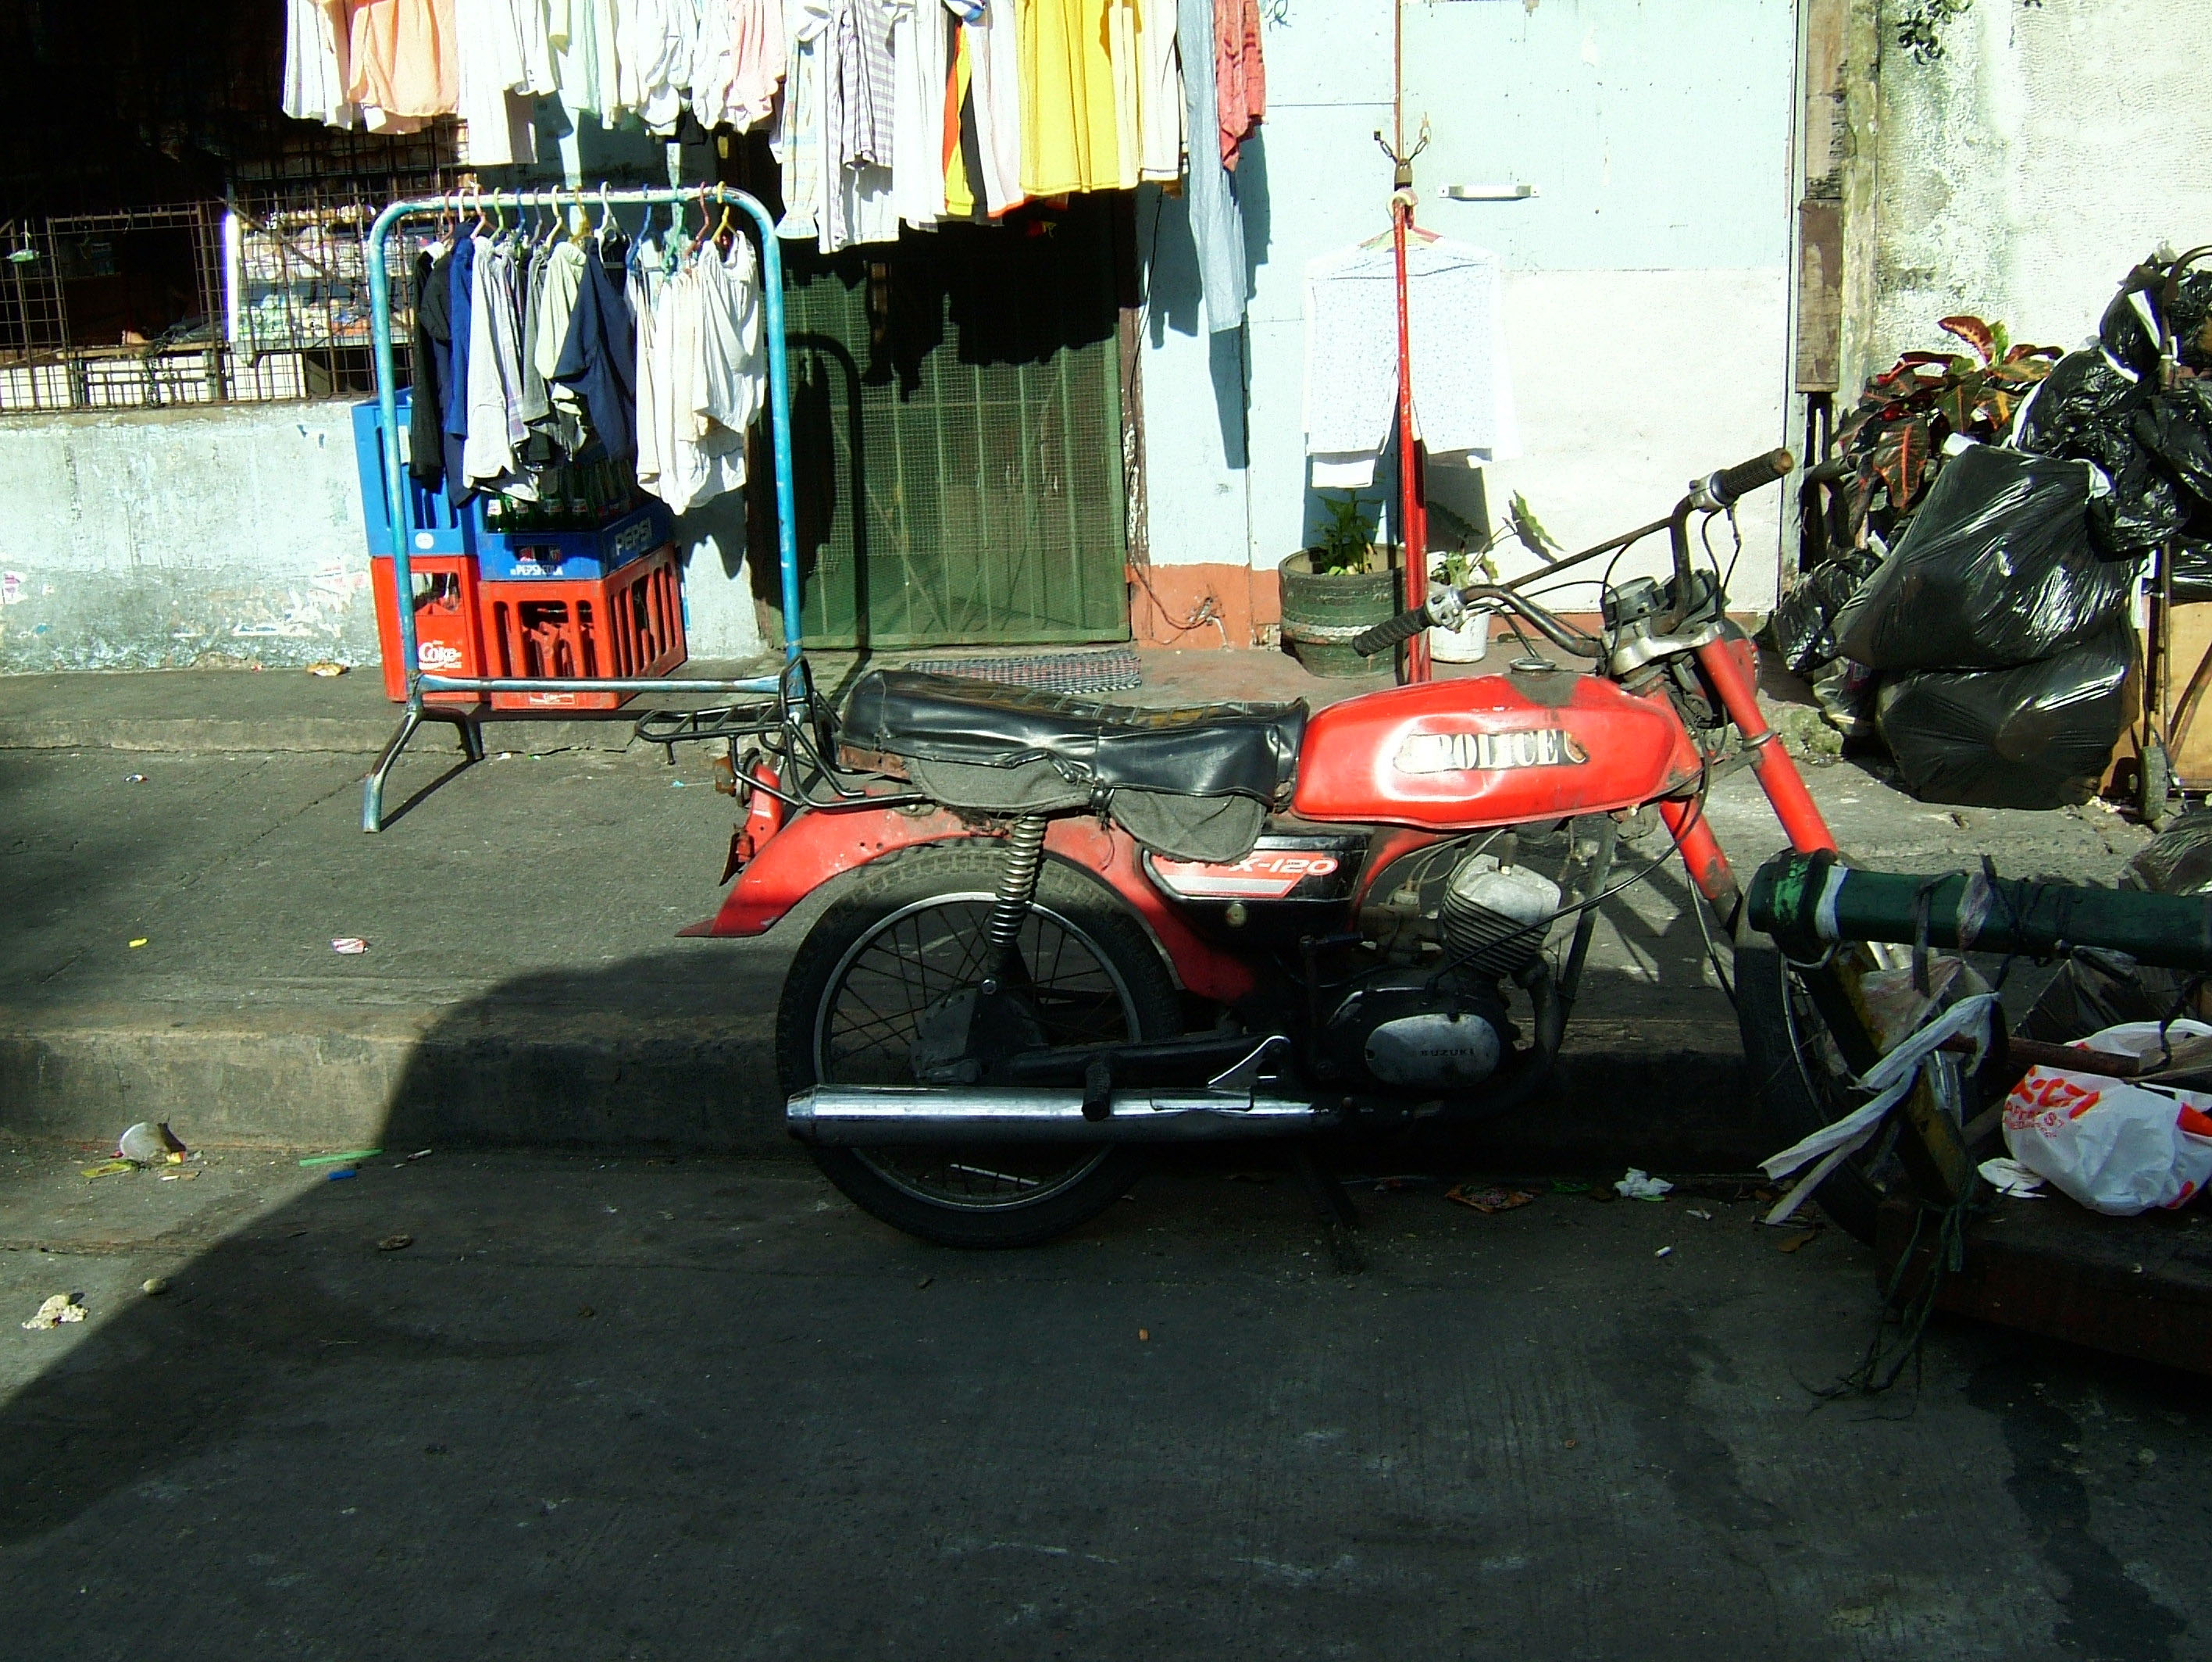 Philippines Luzon Manila Malate Area Street Scenes Dec 2003 01